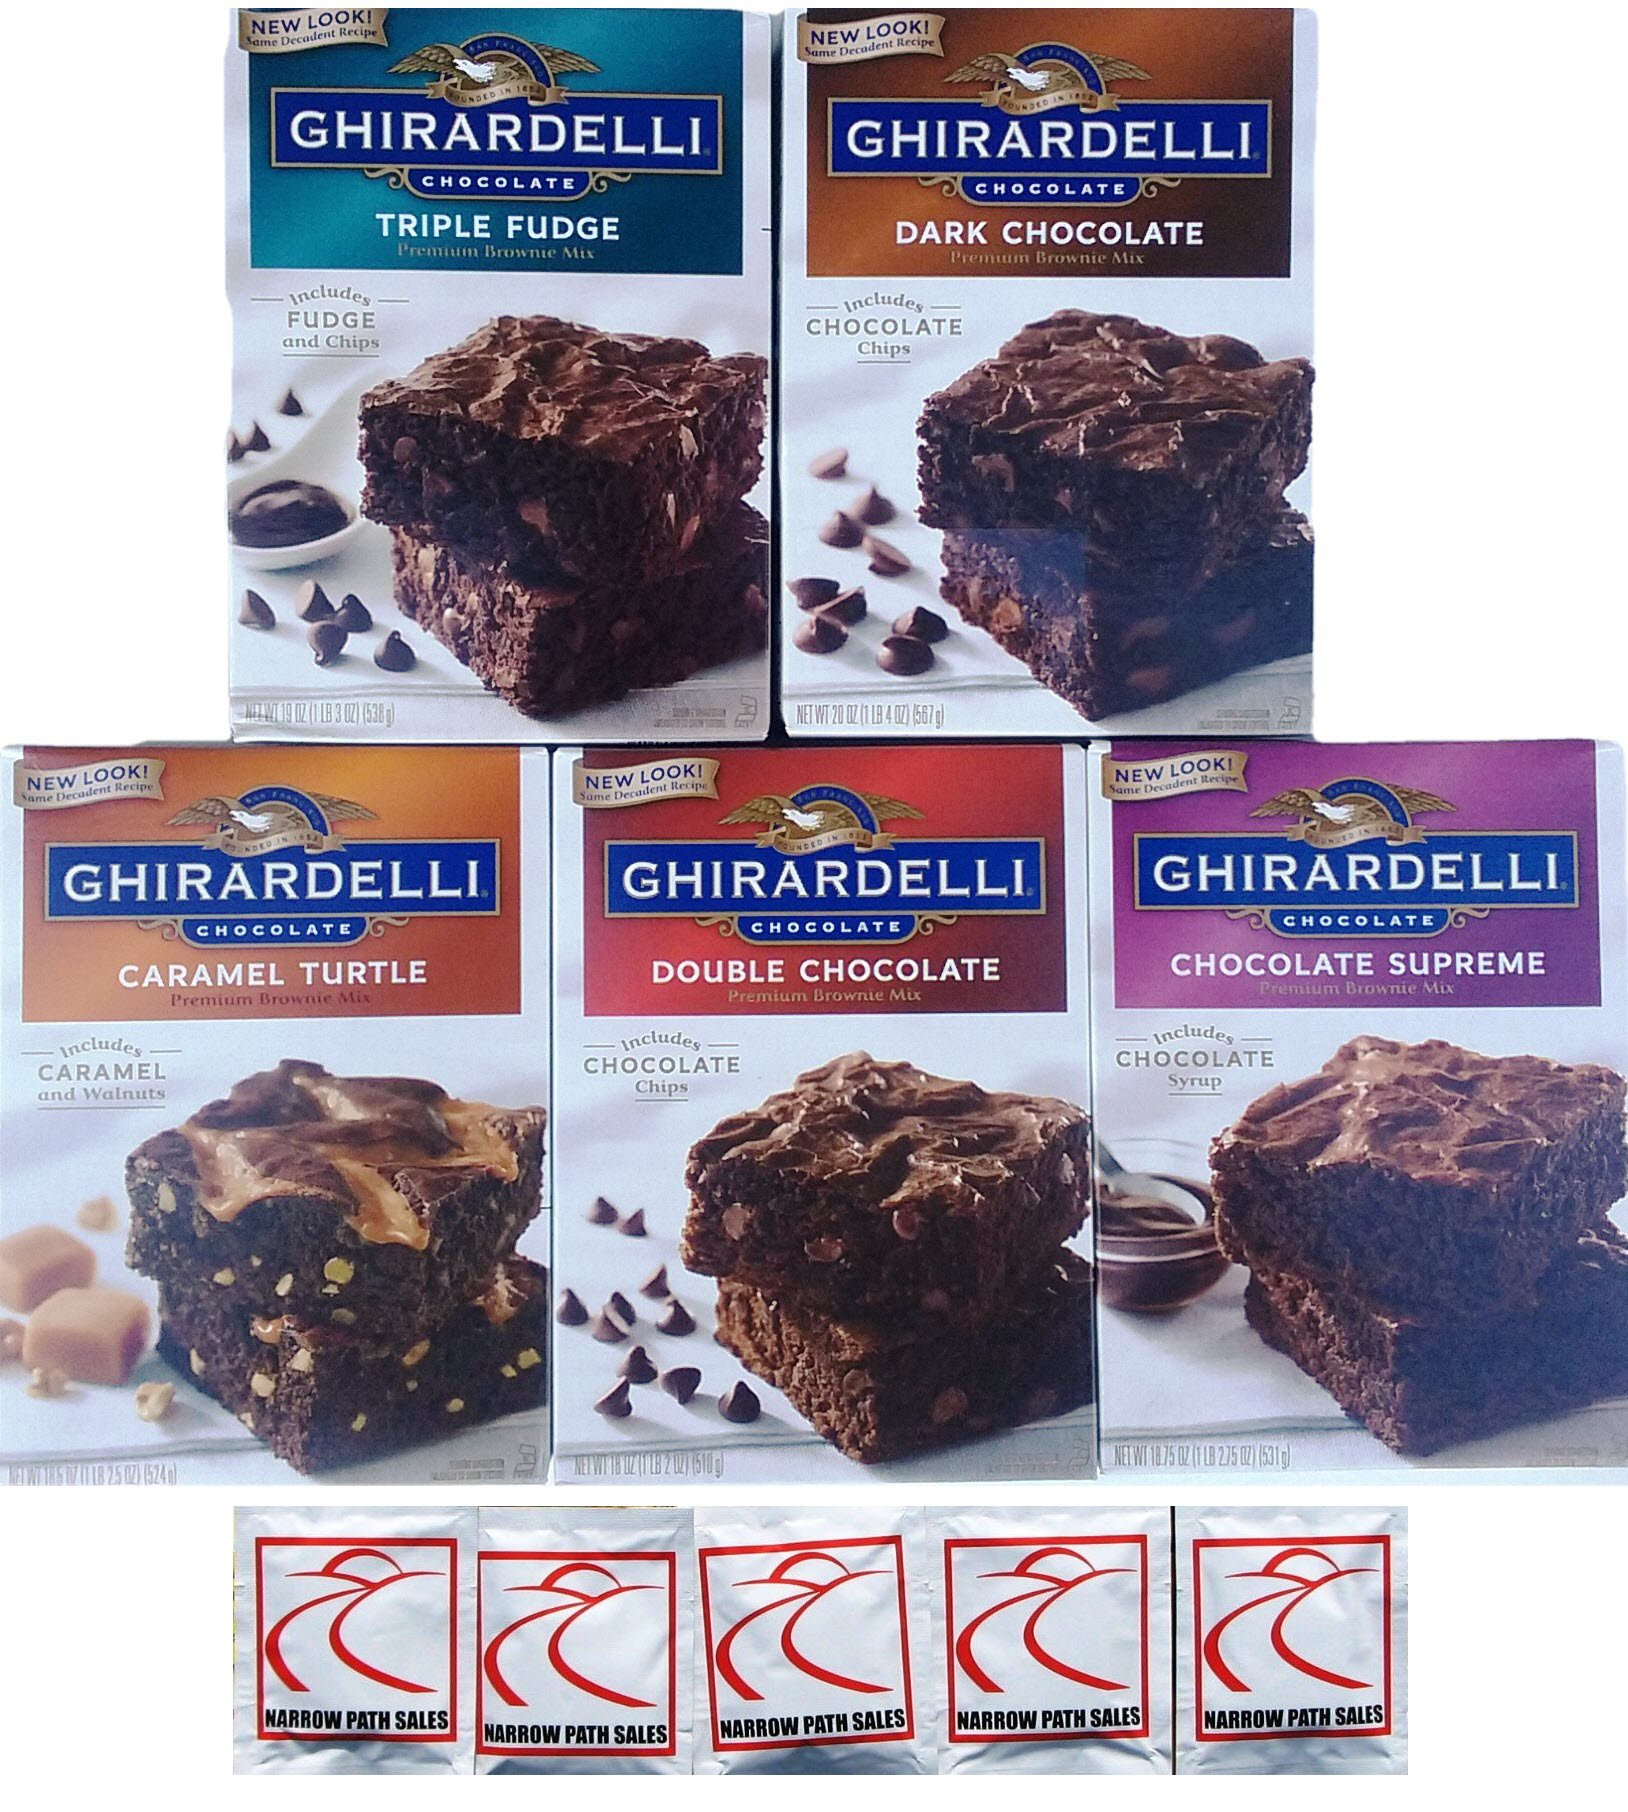 Ghirardelli Premium Chocolate Brownie Mix Variety - Bundle of 5 Flavors - Triple Fudge, Caramel Turtle, Double Chocolate, Chocolate Supreme, Dark Chocolate Gift Box by Narrow Path Sales (Image #5)